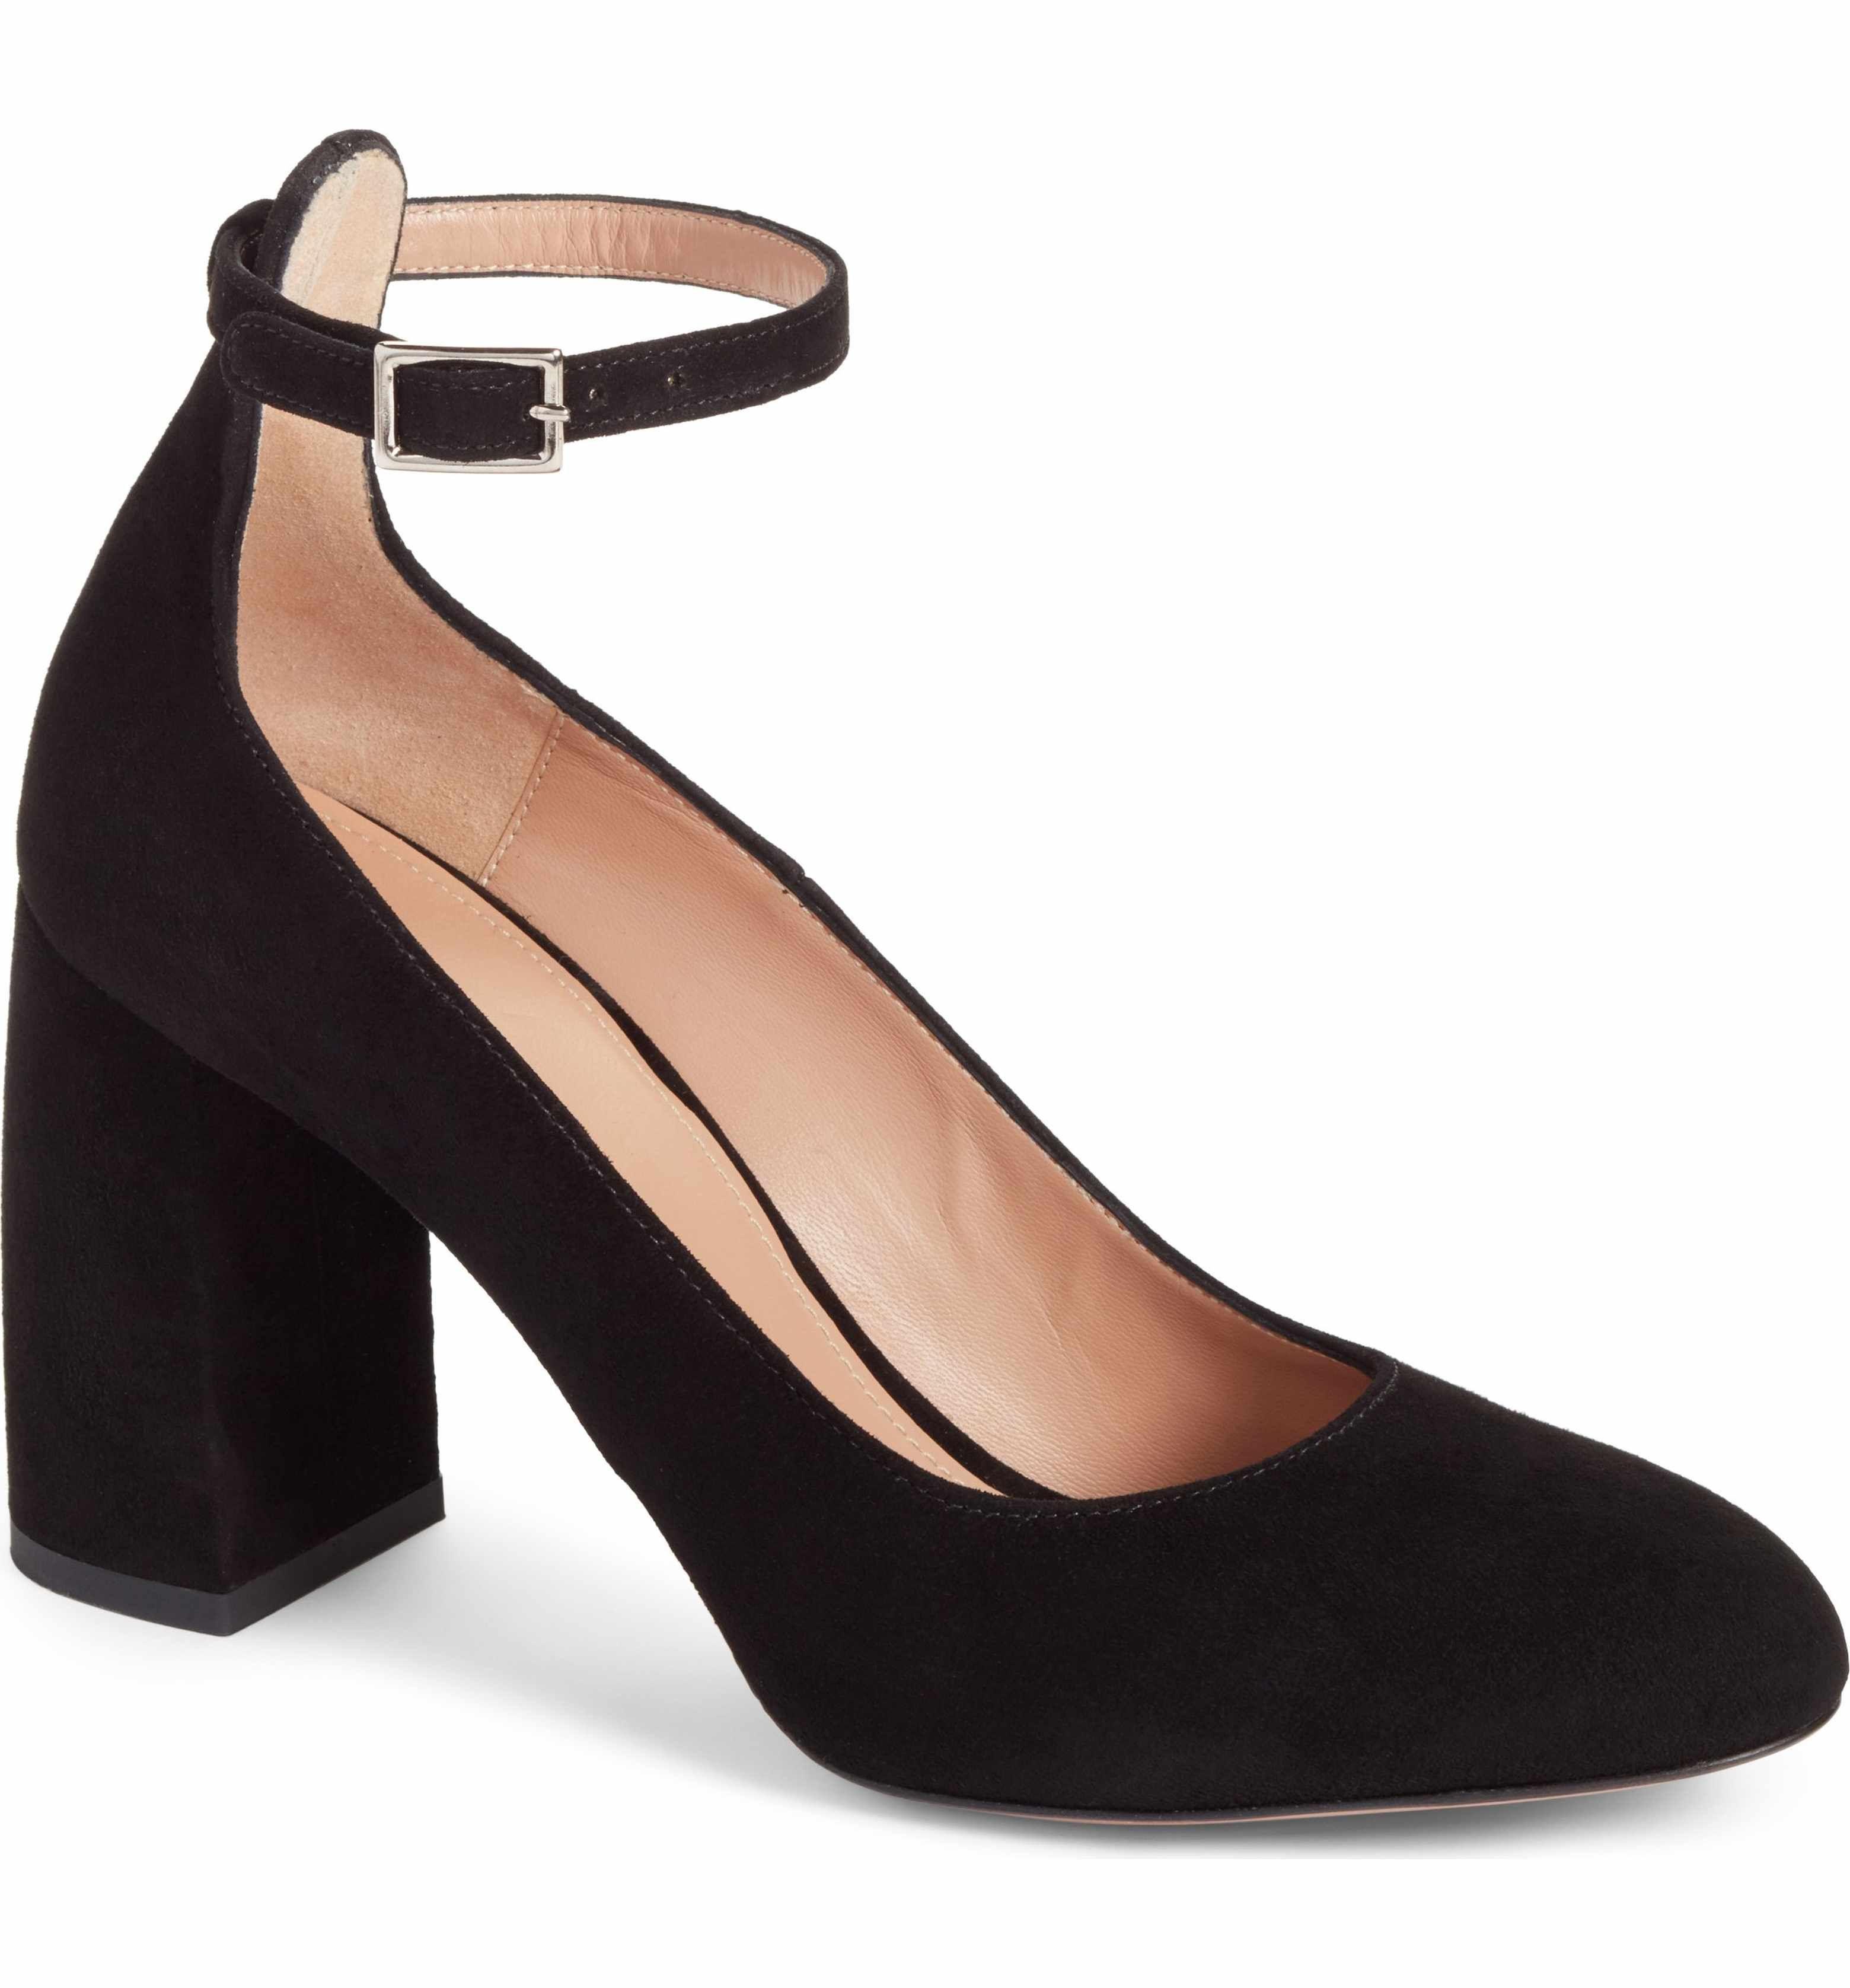 Style Co. Womens Seleste Open Toe Ankle Strap Classic Pumps Black Size 8.0 P